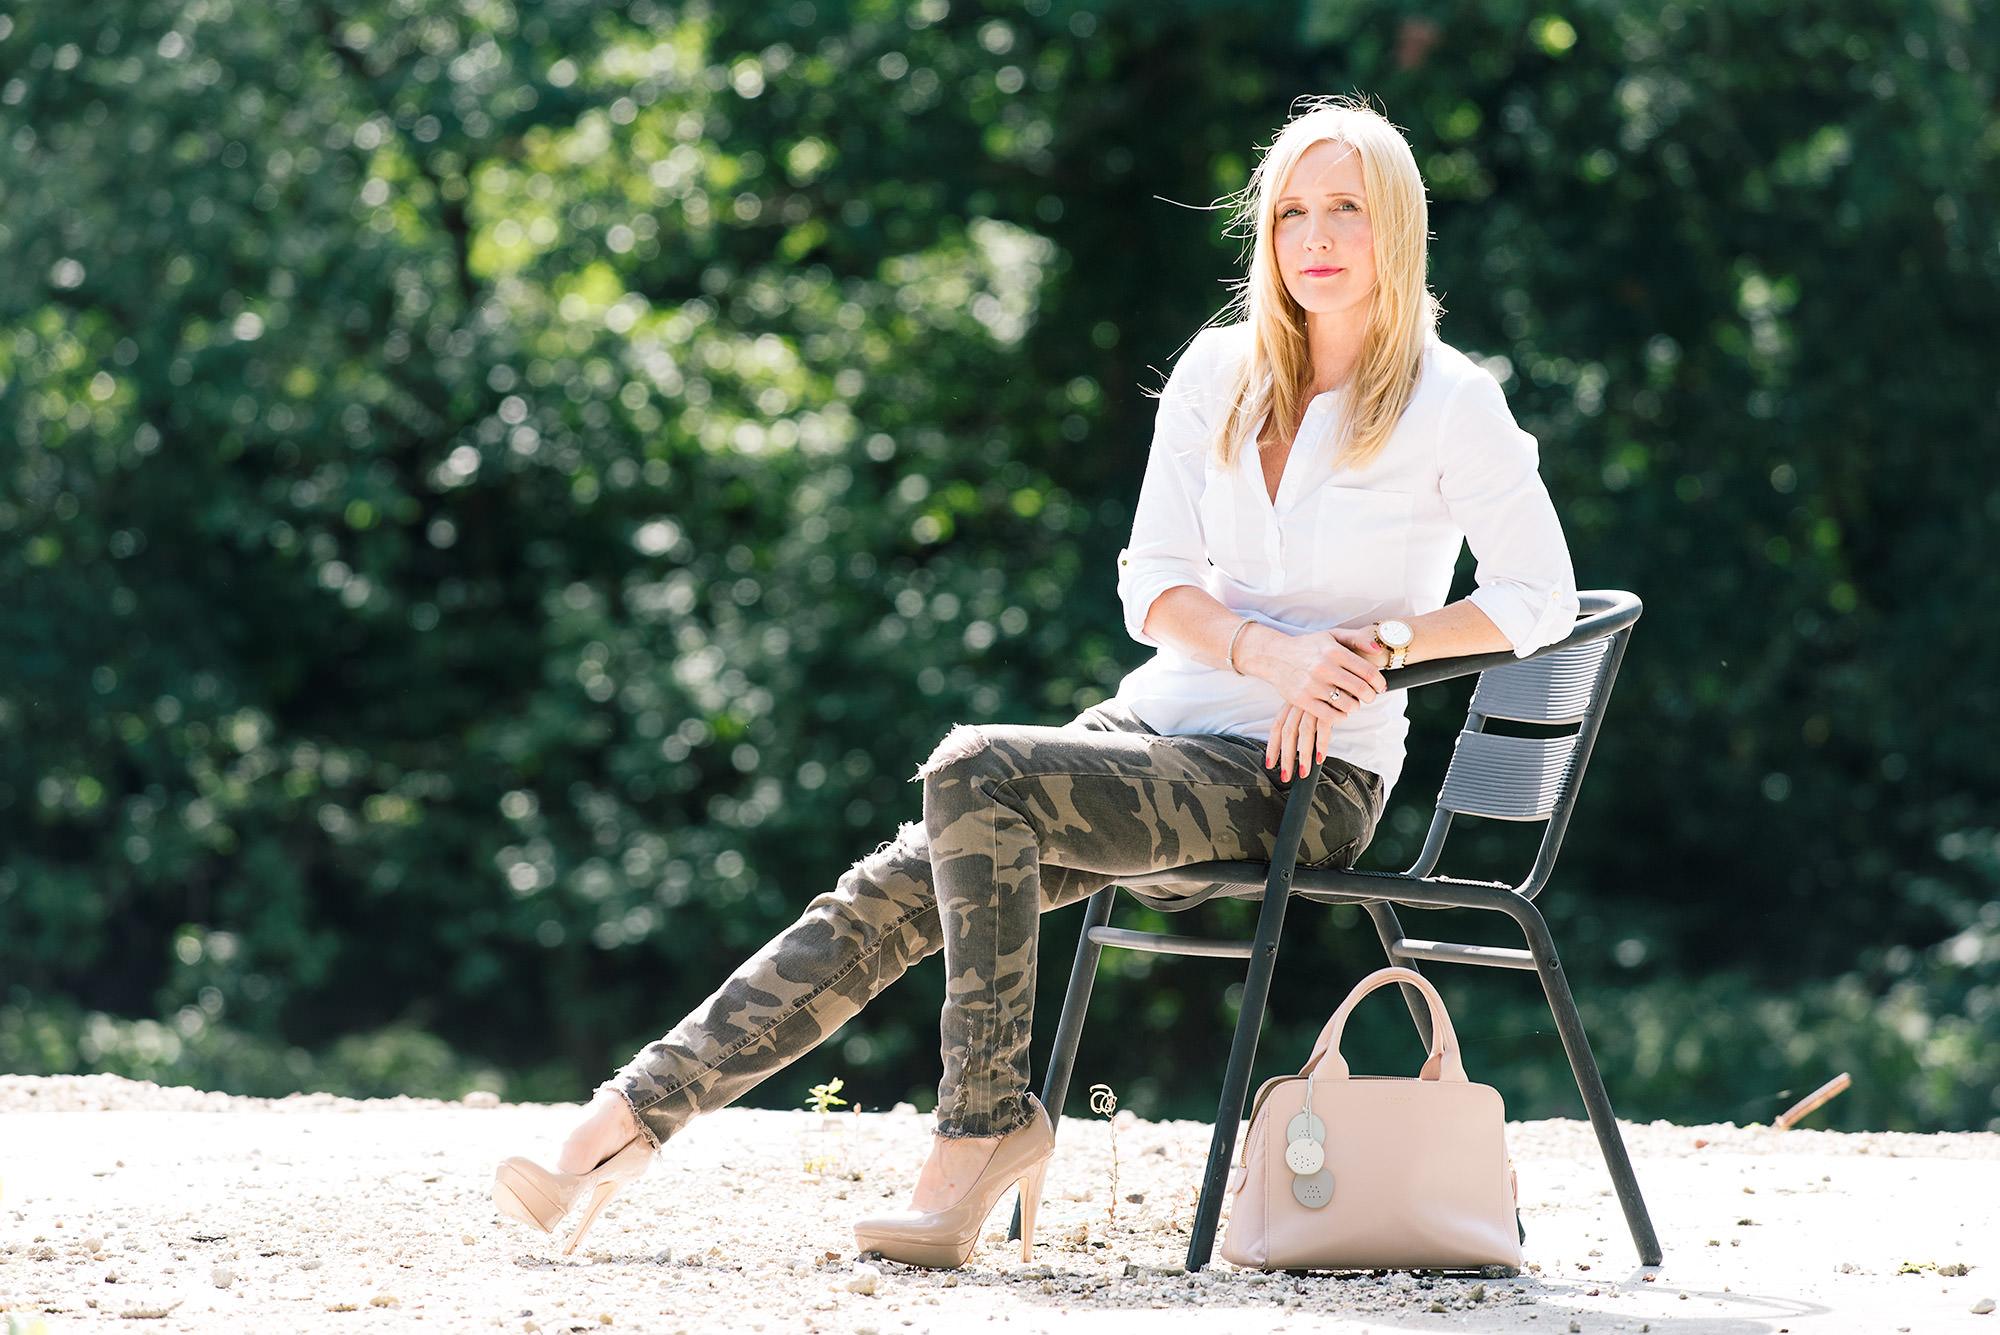 fashionbloggerwearingzara